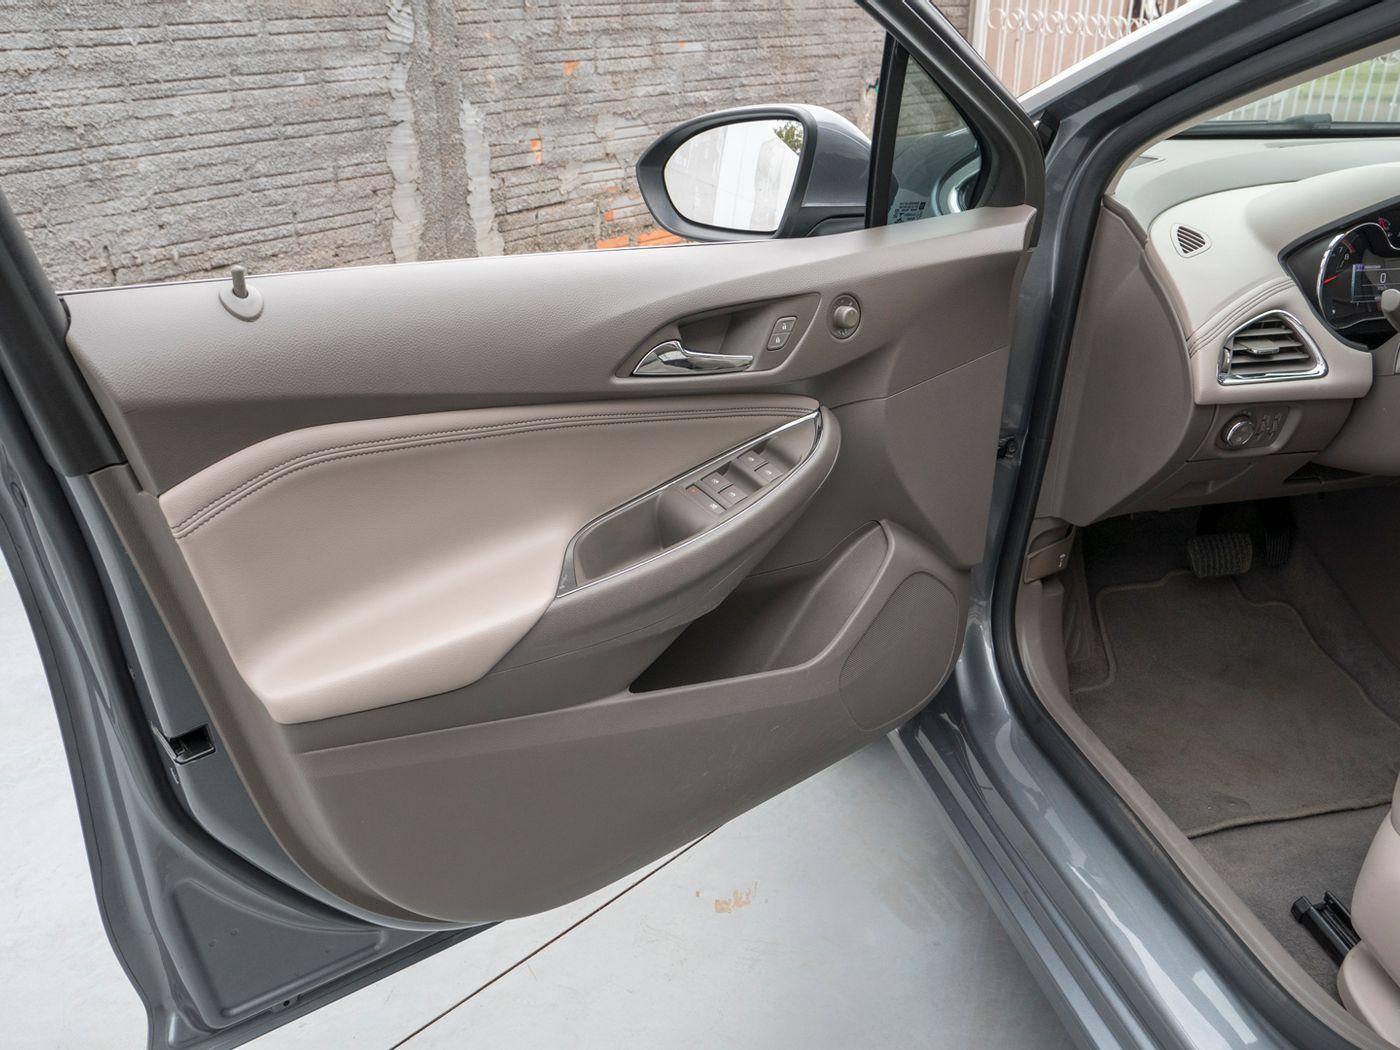 Chevrolet CRUZE Sport LTZ 1.4 16V TB Flex 5p Aut.